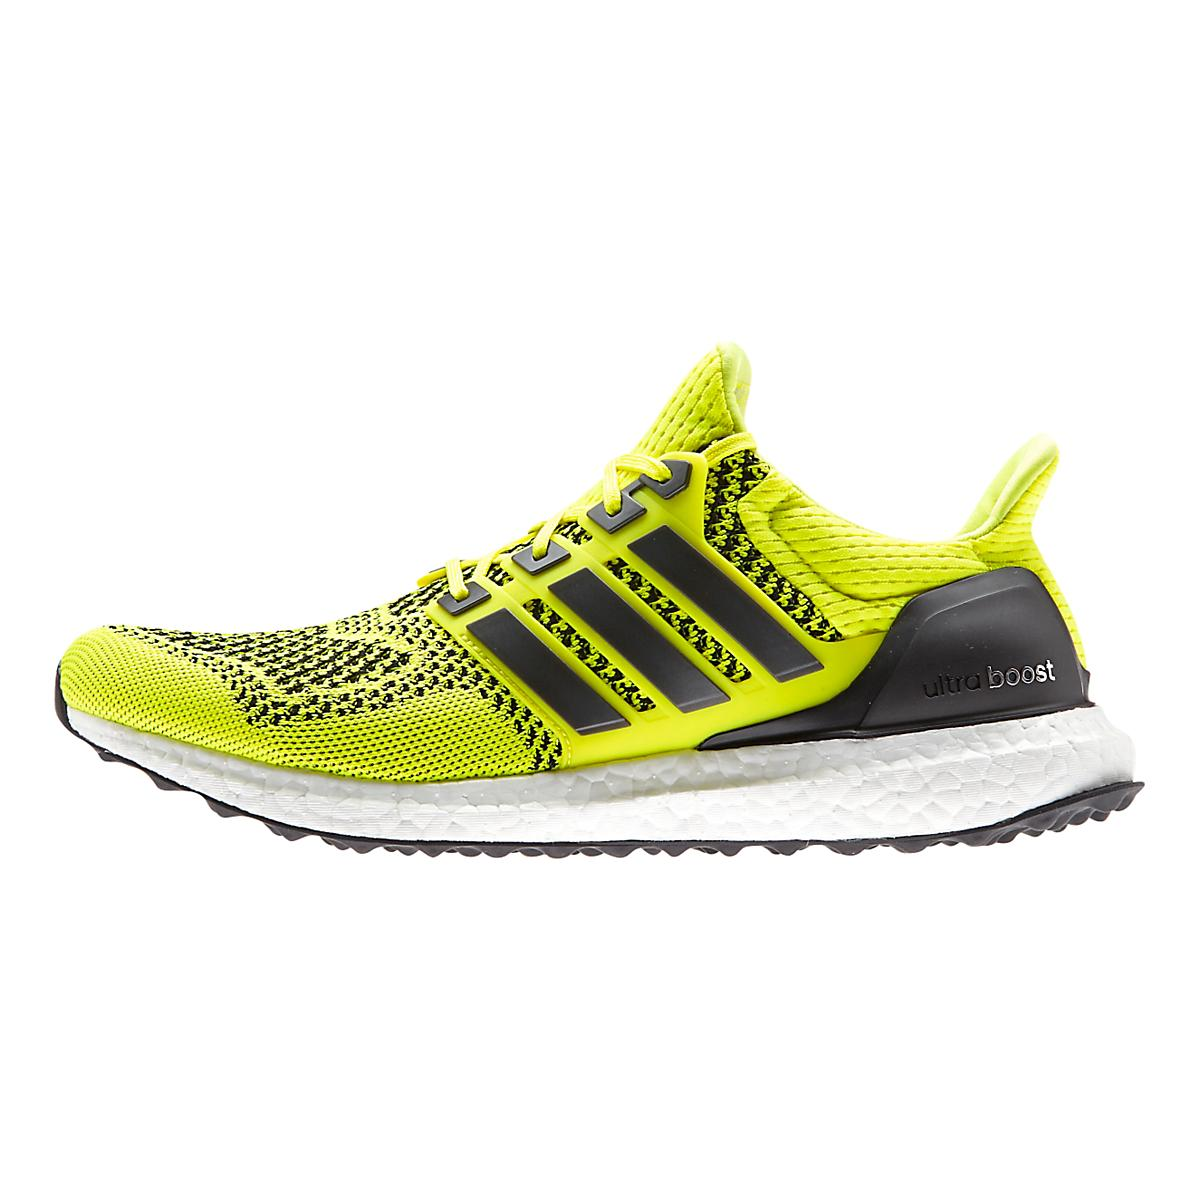 Mens adidas Ultra Boost Running Shoe at Road Runner Sports ce56da0b6886